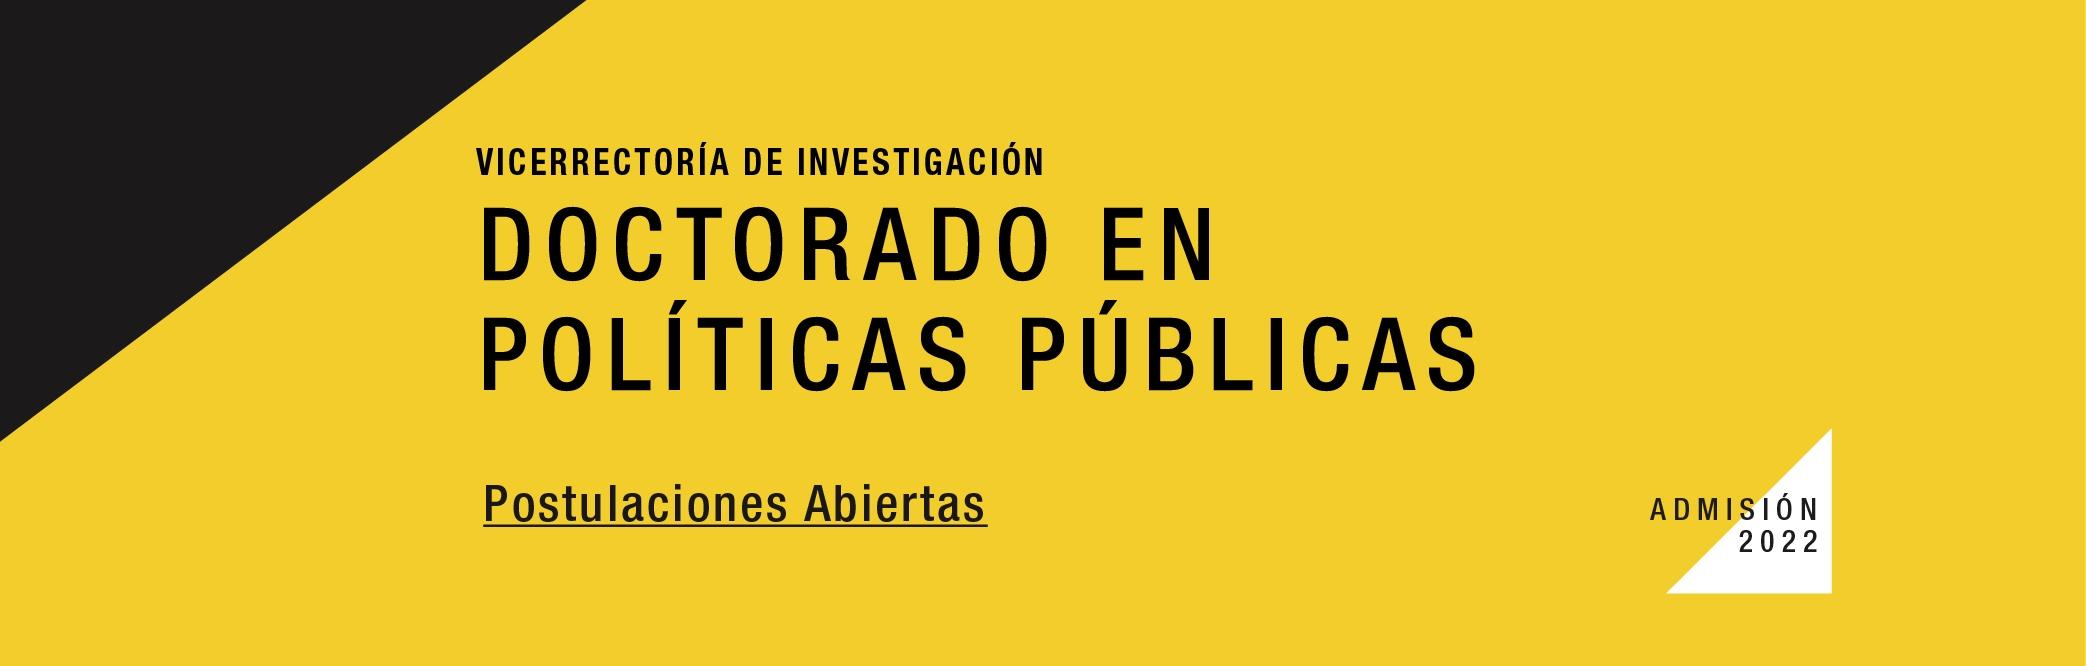 Banner linkedin Doctorado Politicas Publicas